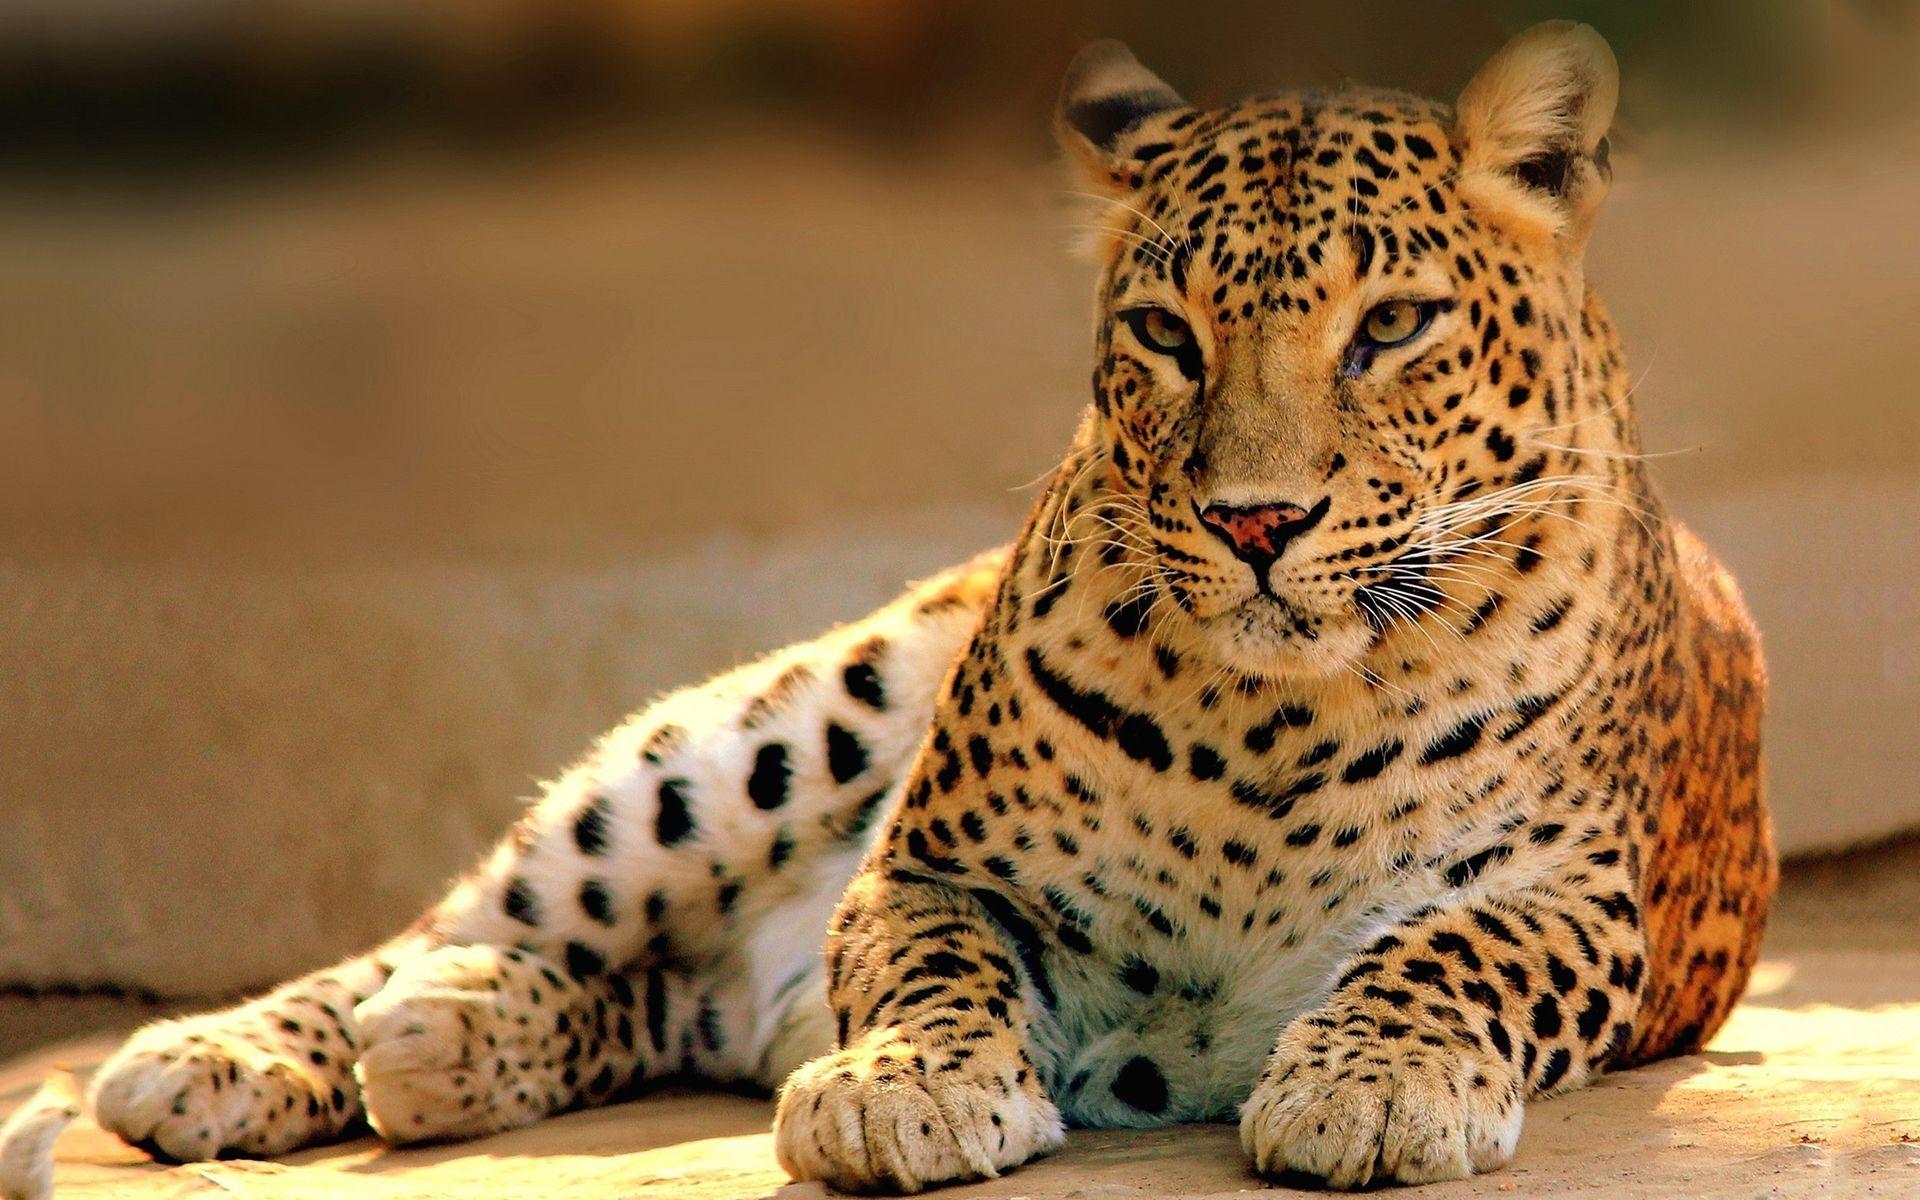 Ultra hd leopard wildlife ultra hd animals wallpapers - Ultra hd animal wallpapers ...